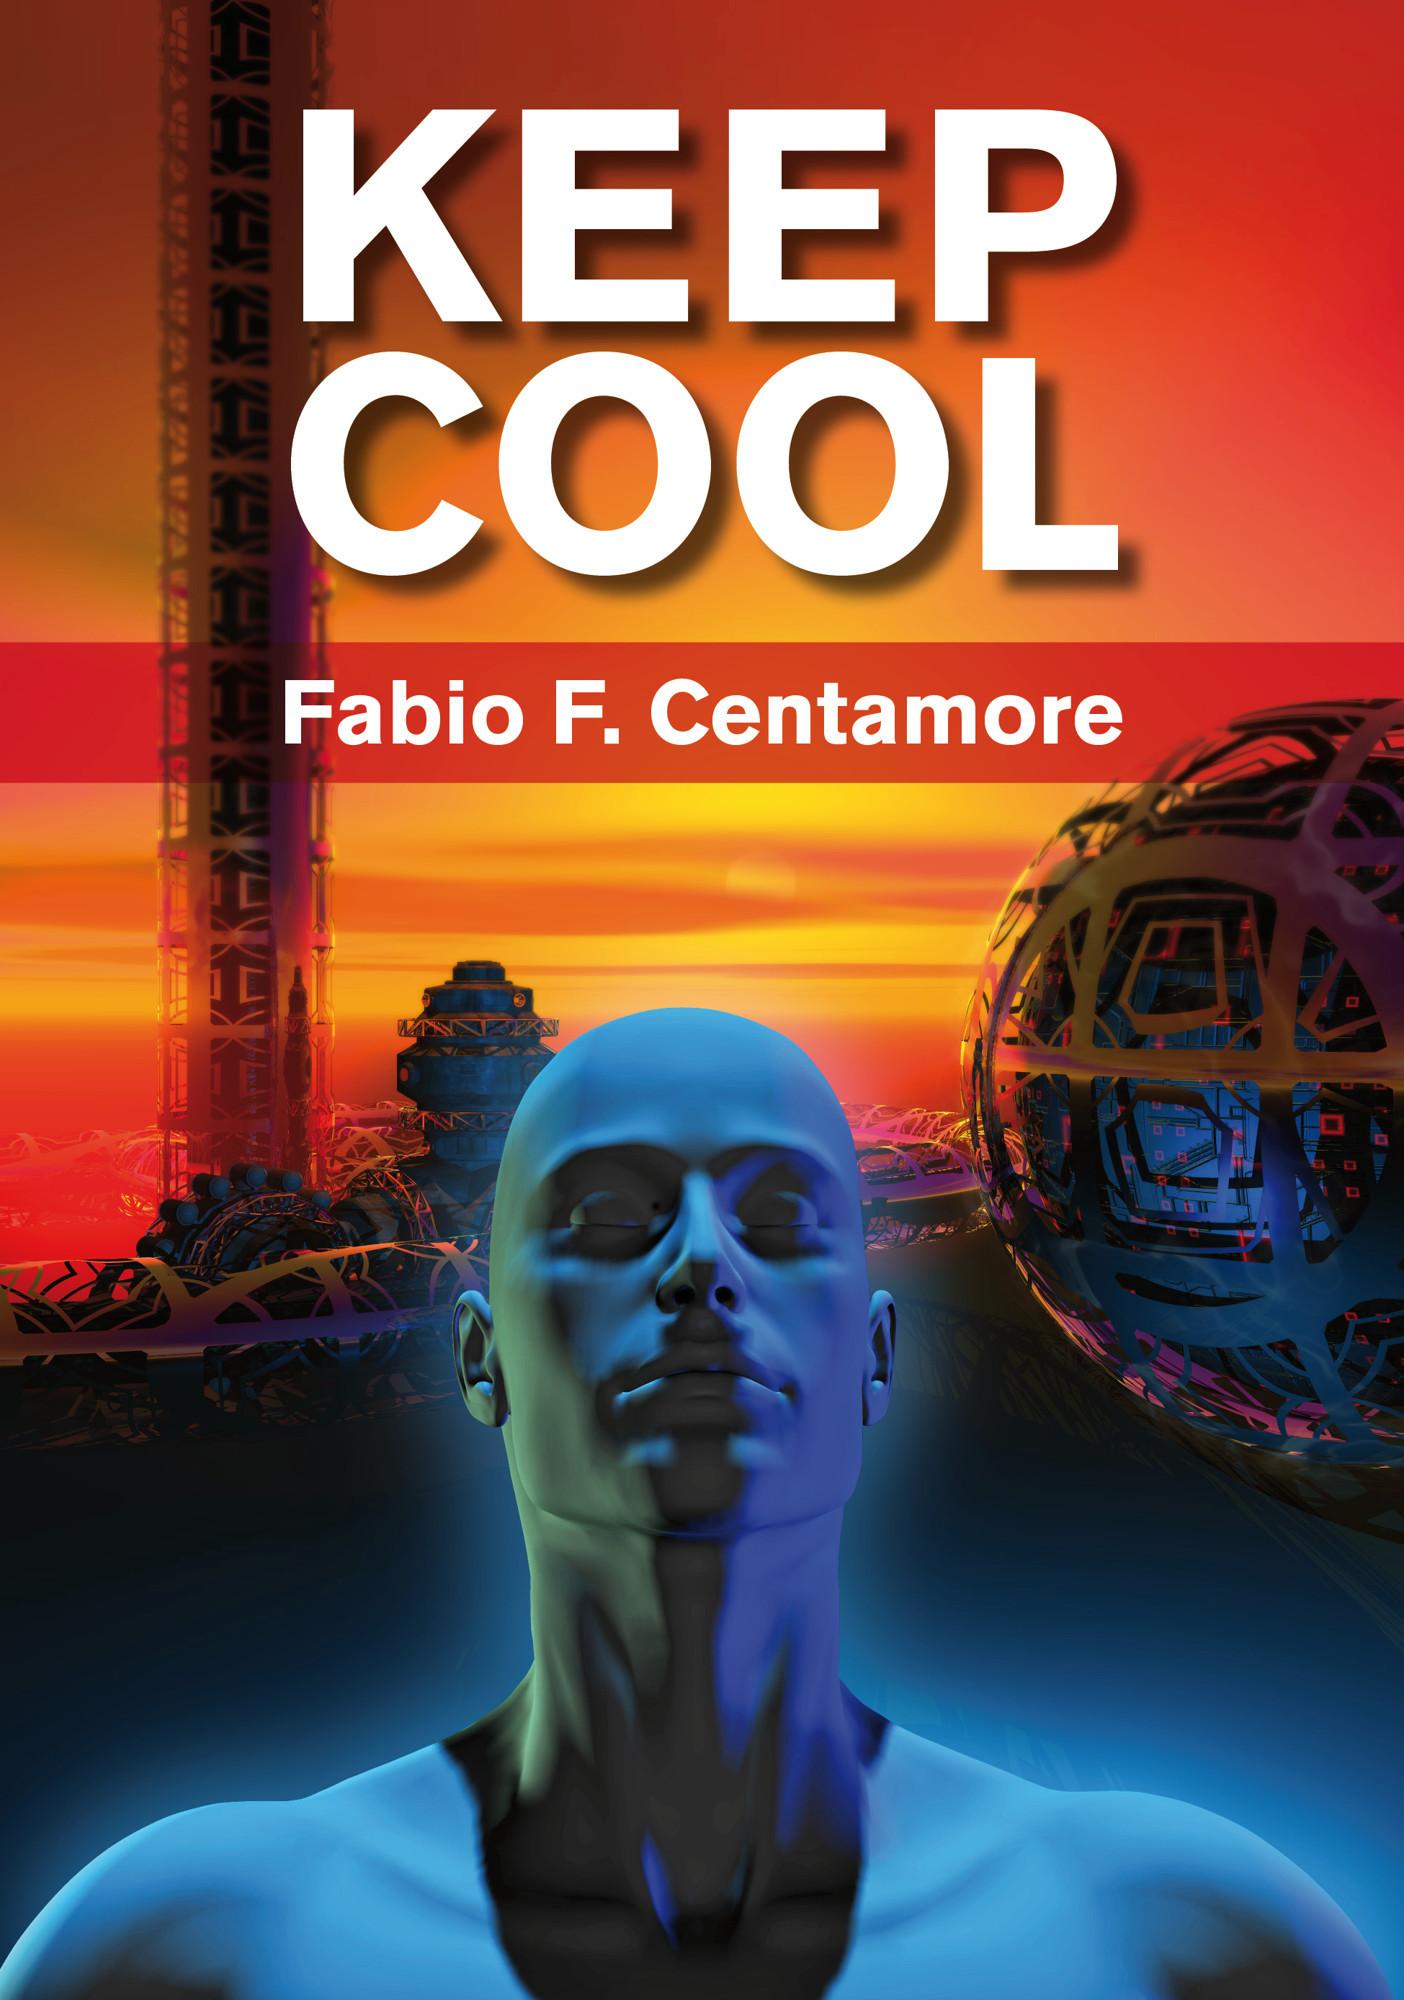 Keep Cool Fabio F. Centamore